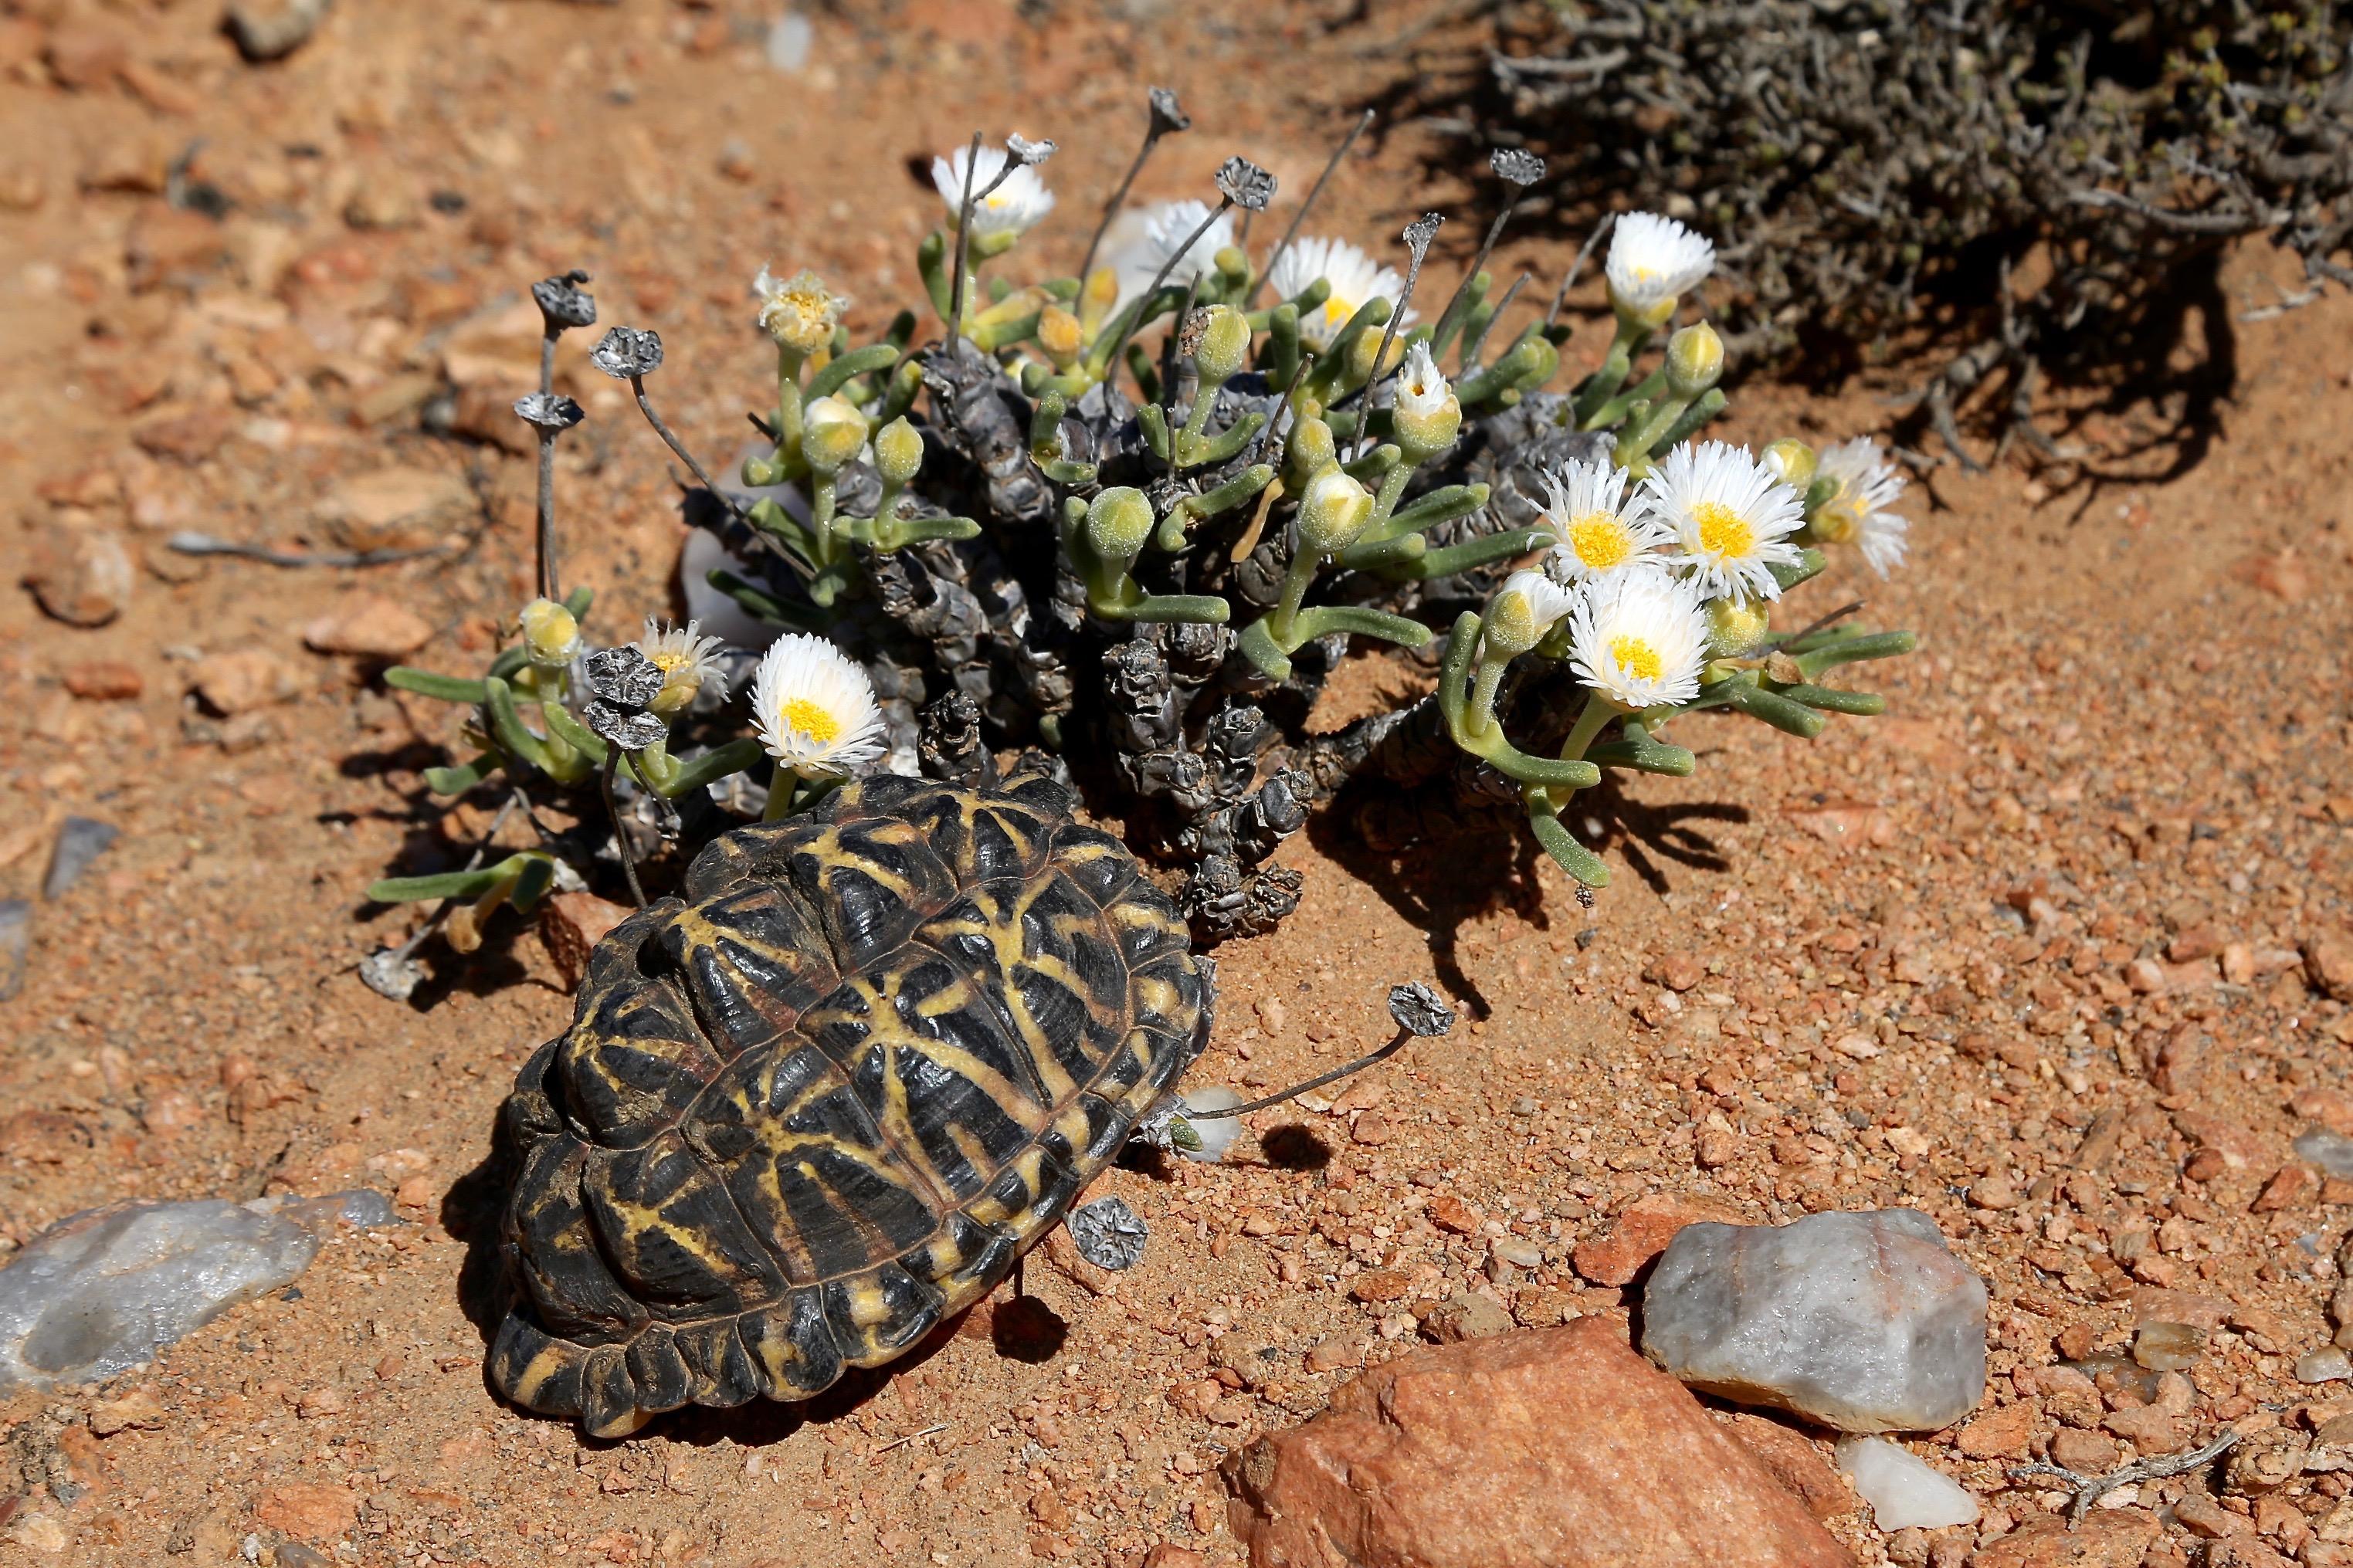 Monilaria scutata ssp. obovata (Aizoaceae) with the Karoo tent tortoise (Psammobates tentorius trimeni)